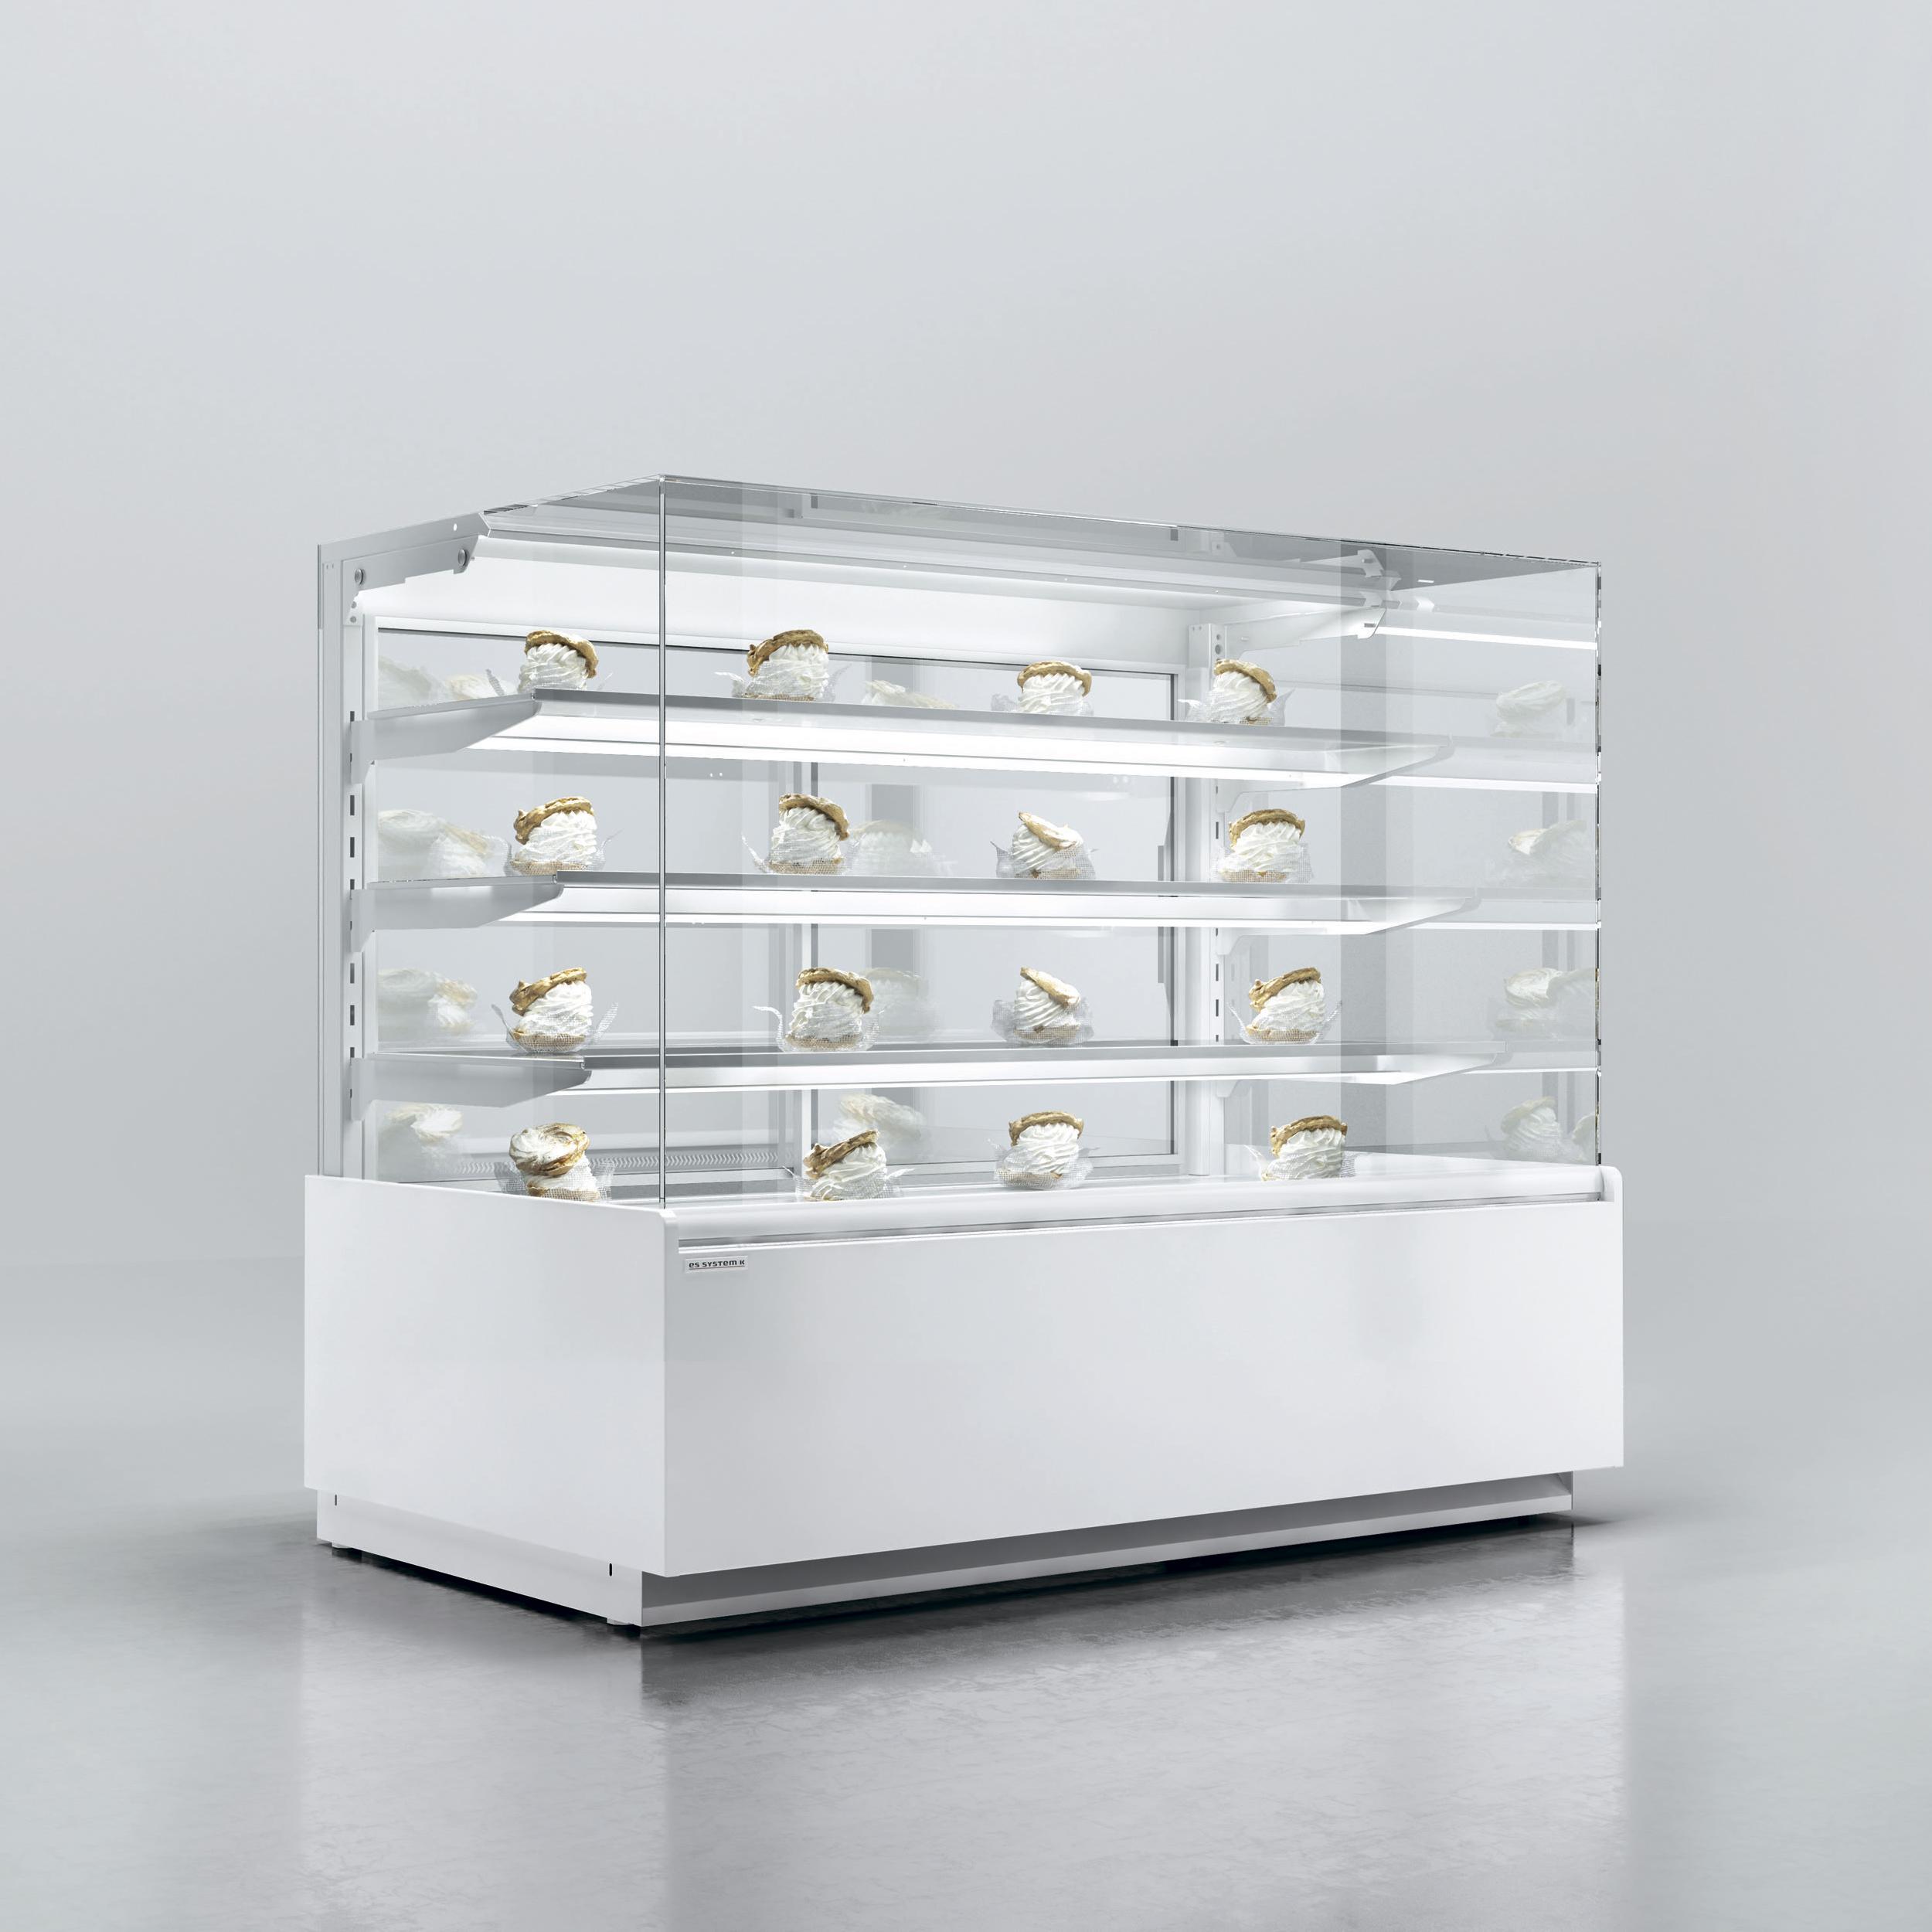 Витрина холодильная ES SYSTEM K LCC Carina 04 1,4